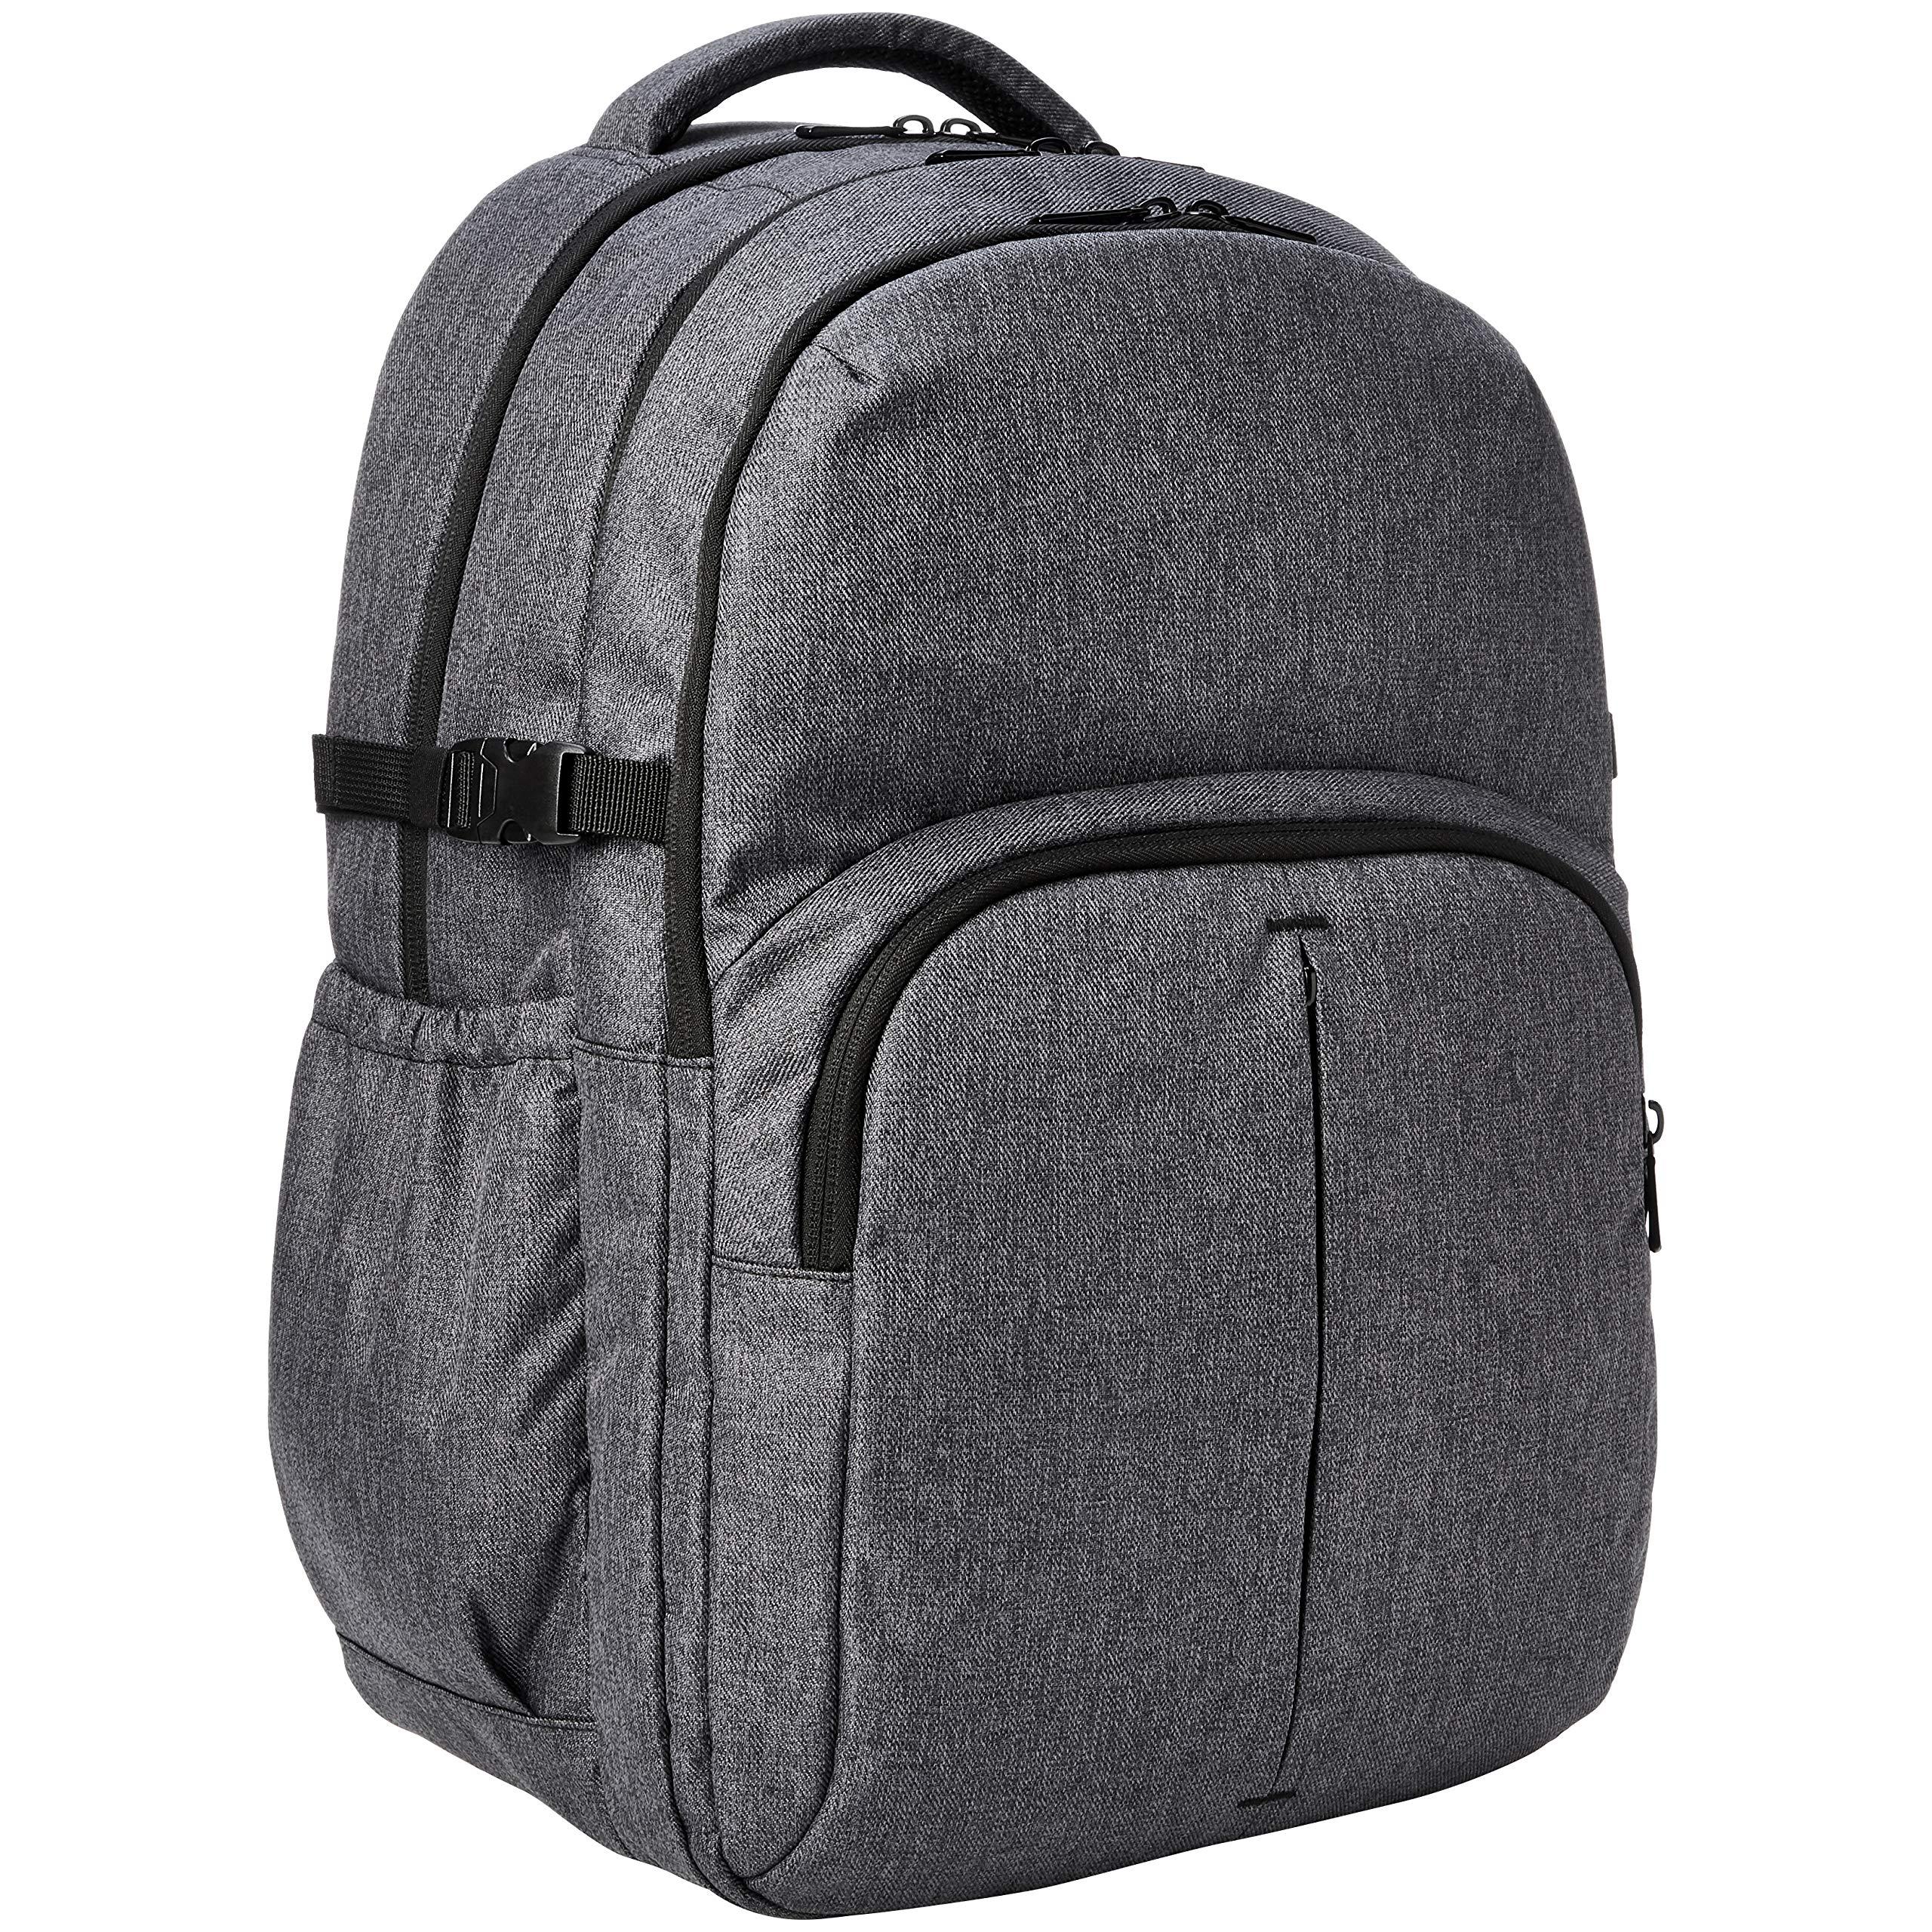 AmazonBasics Urban Laptop Backpack, 15 Inch Notebook Computer Sleeve, Grey